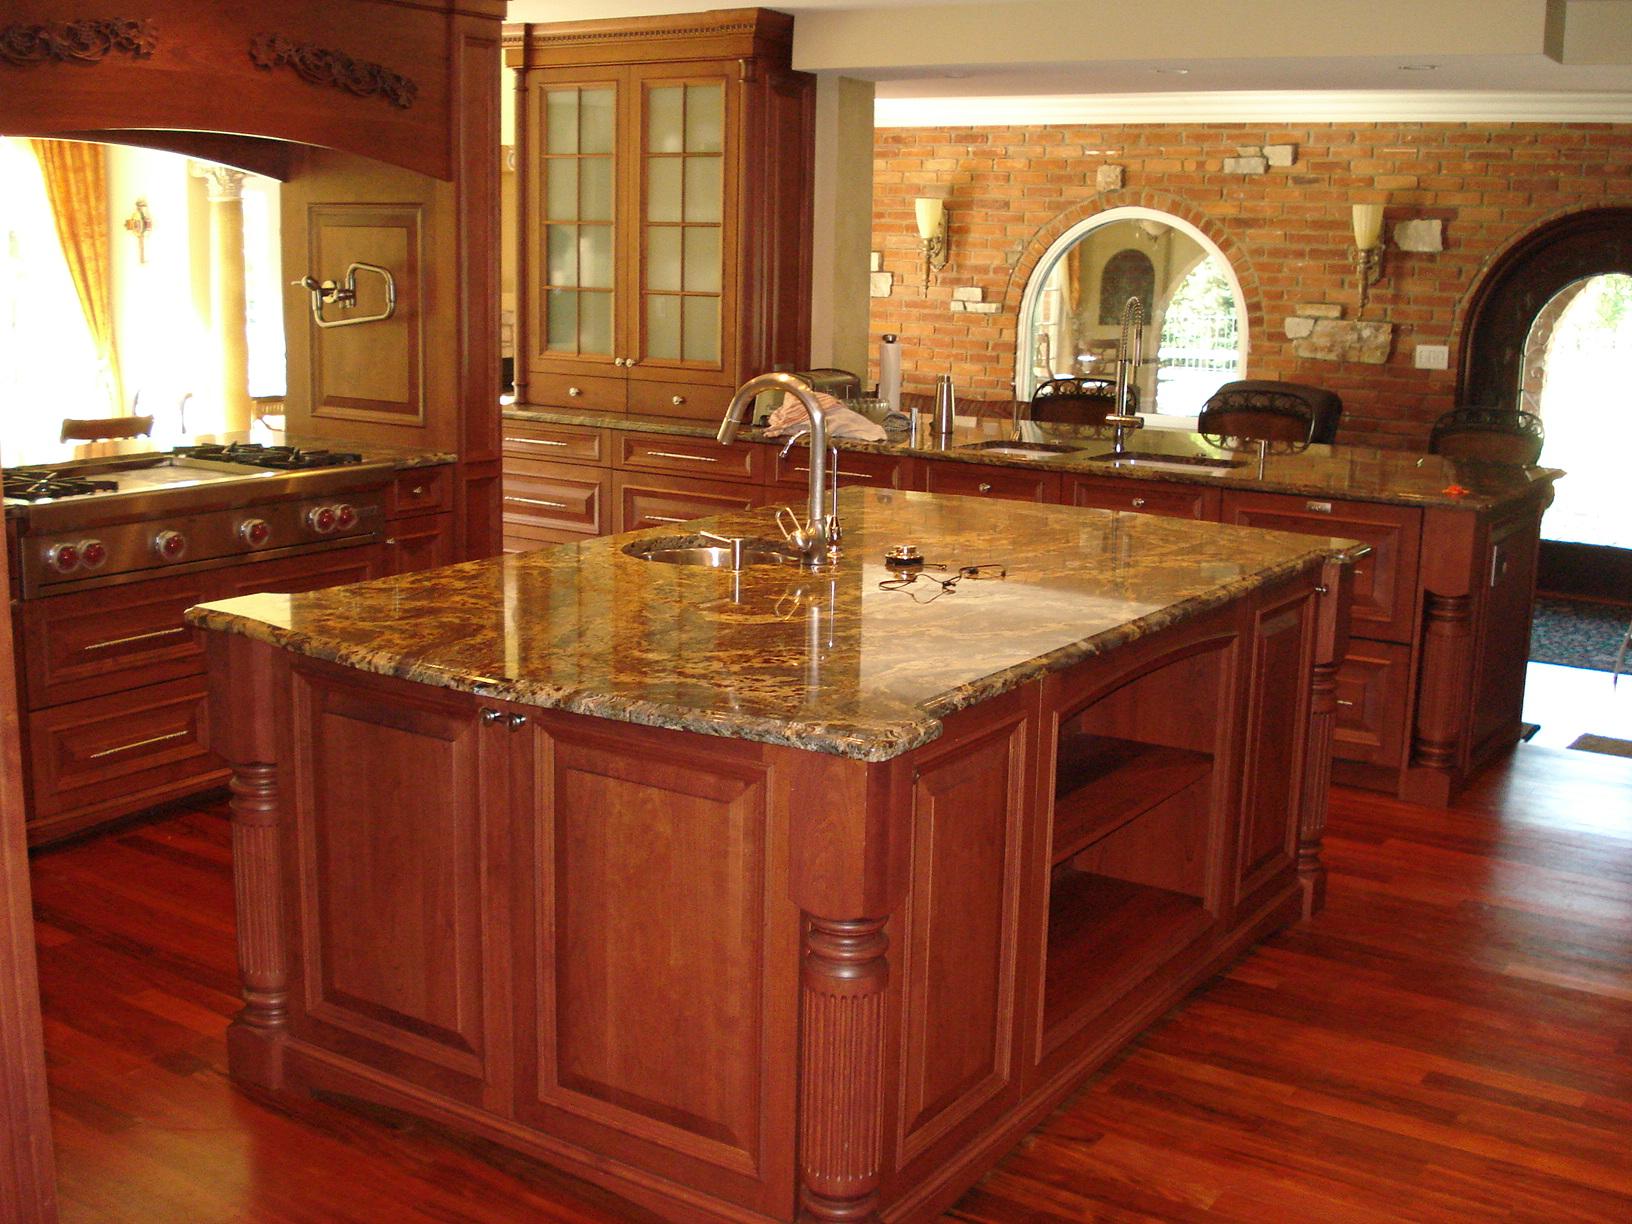 countertops countertops kitchen Countertops